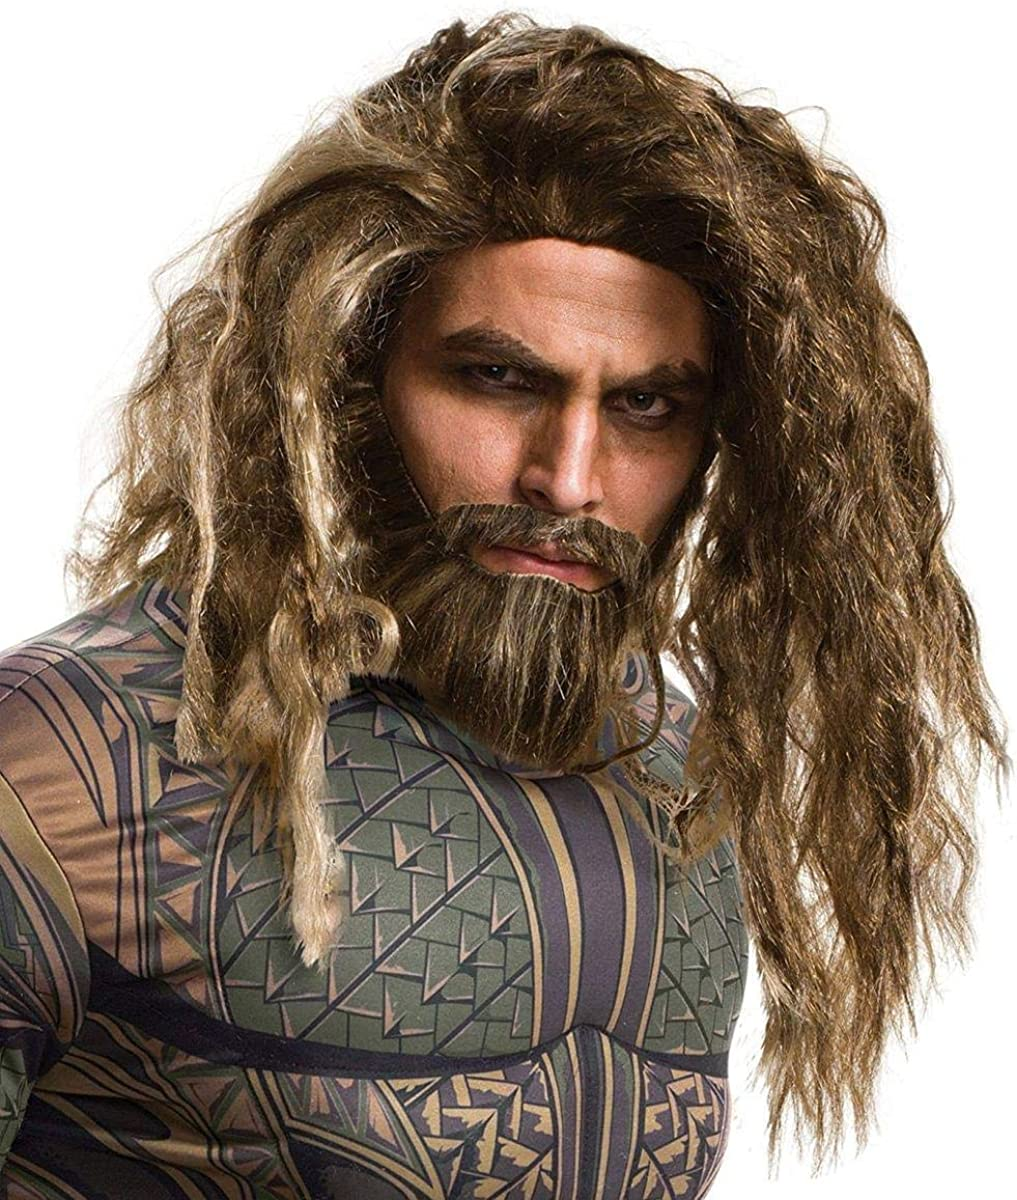 Rubie's Costume Co. Men's Justice League Aquaman Beard and Wig 71aLo-SxKDL